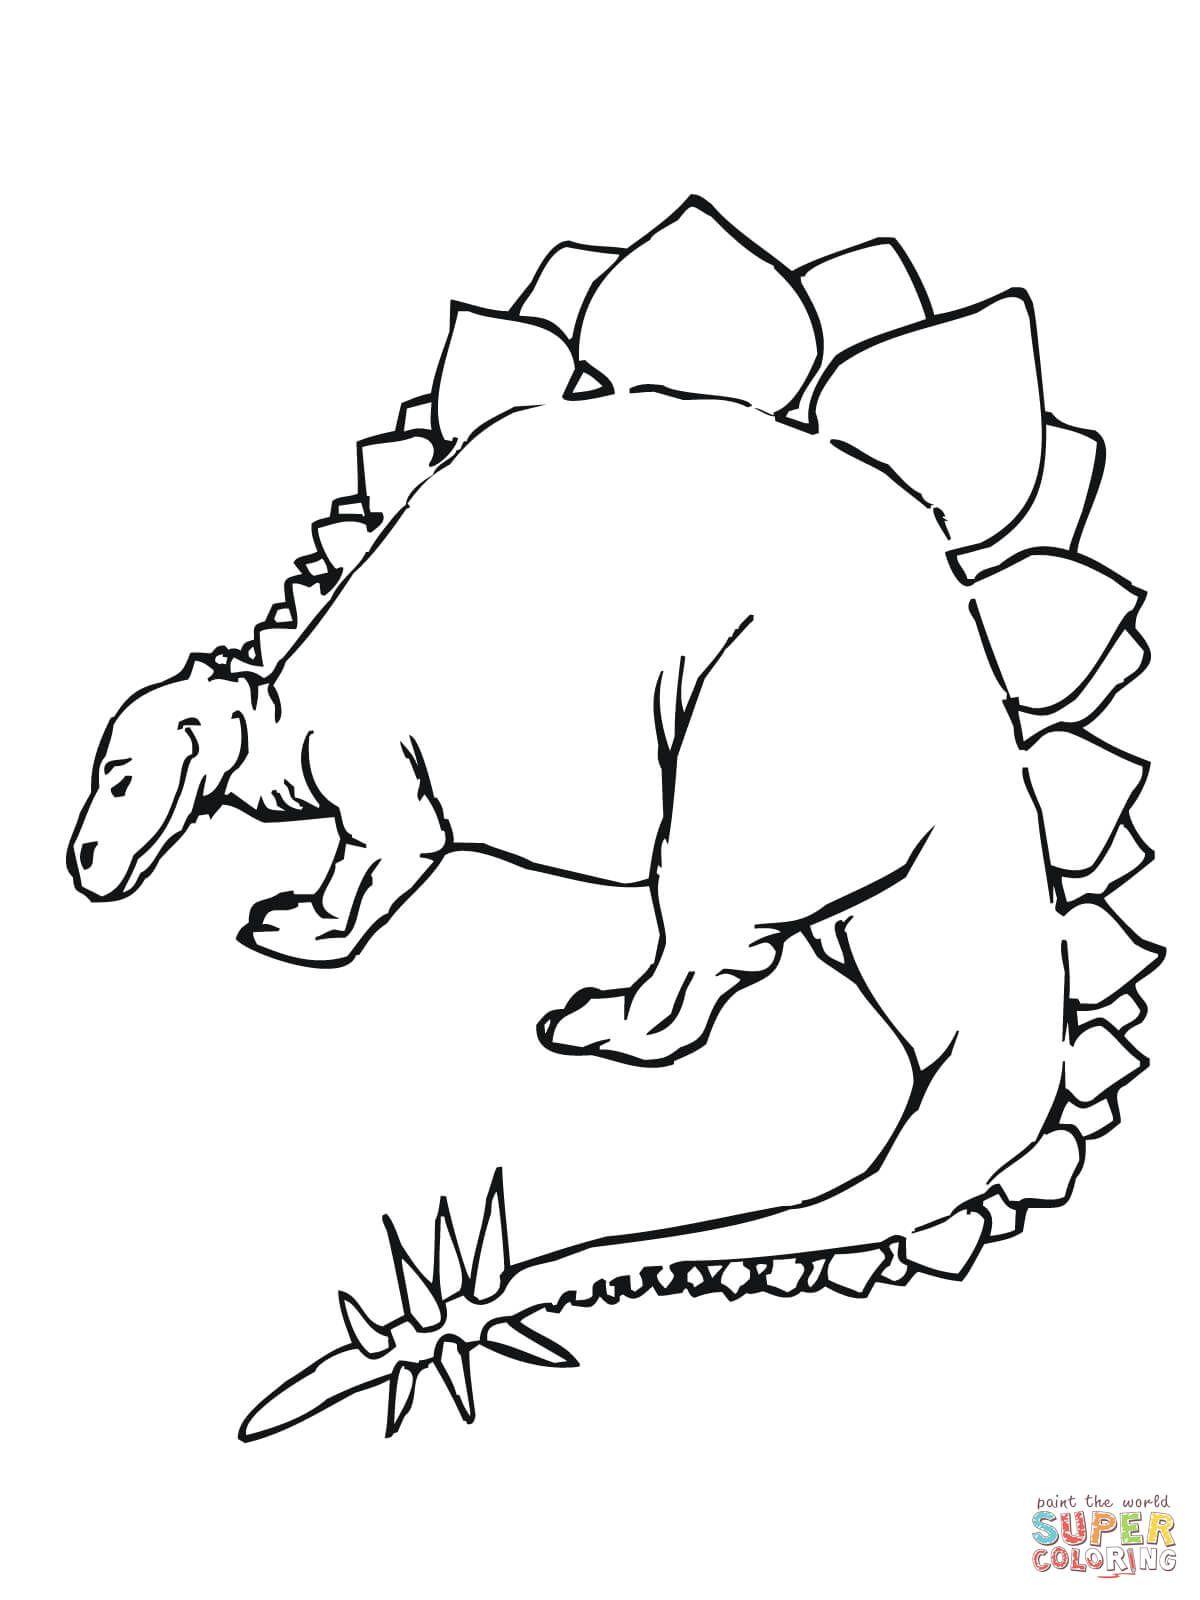 Stegosaurus Jurassic Dinosaur Coloring Page Free Printable Coloring Pages Dinosaur Coloring Pages Dinosaur Coloring Animal Coloring Pages